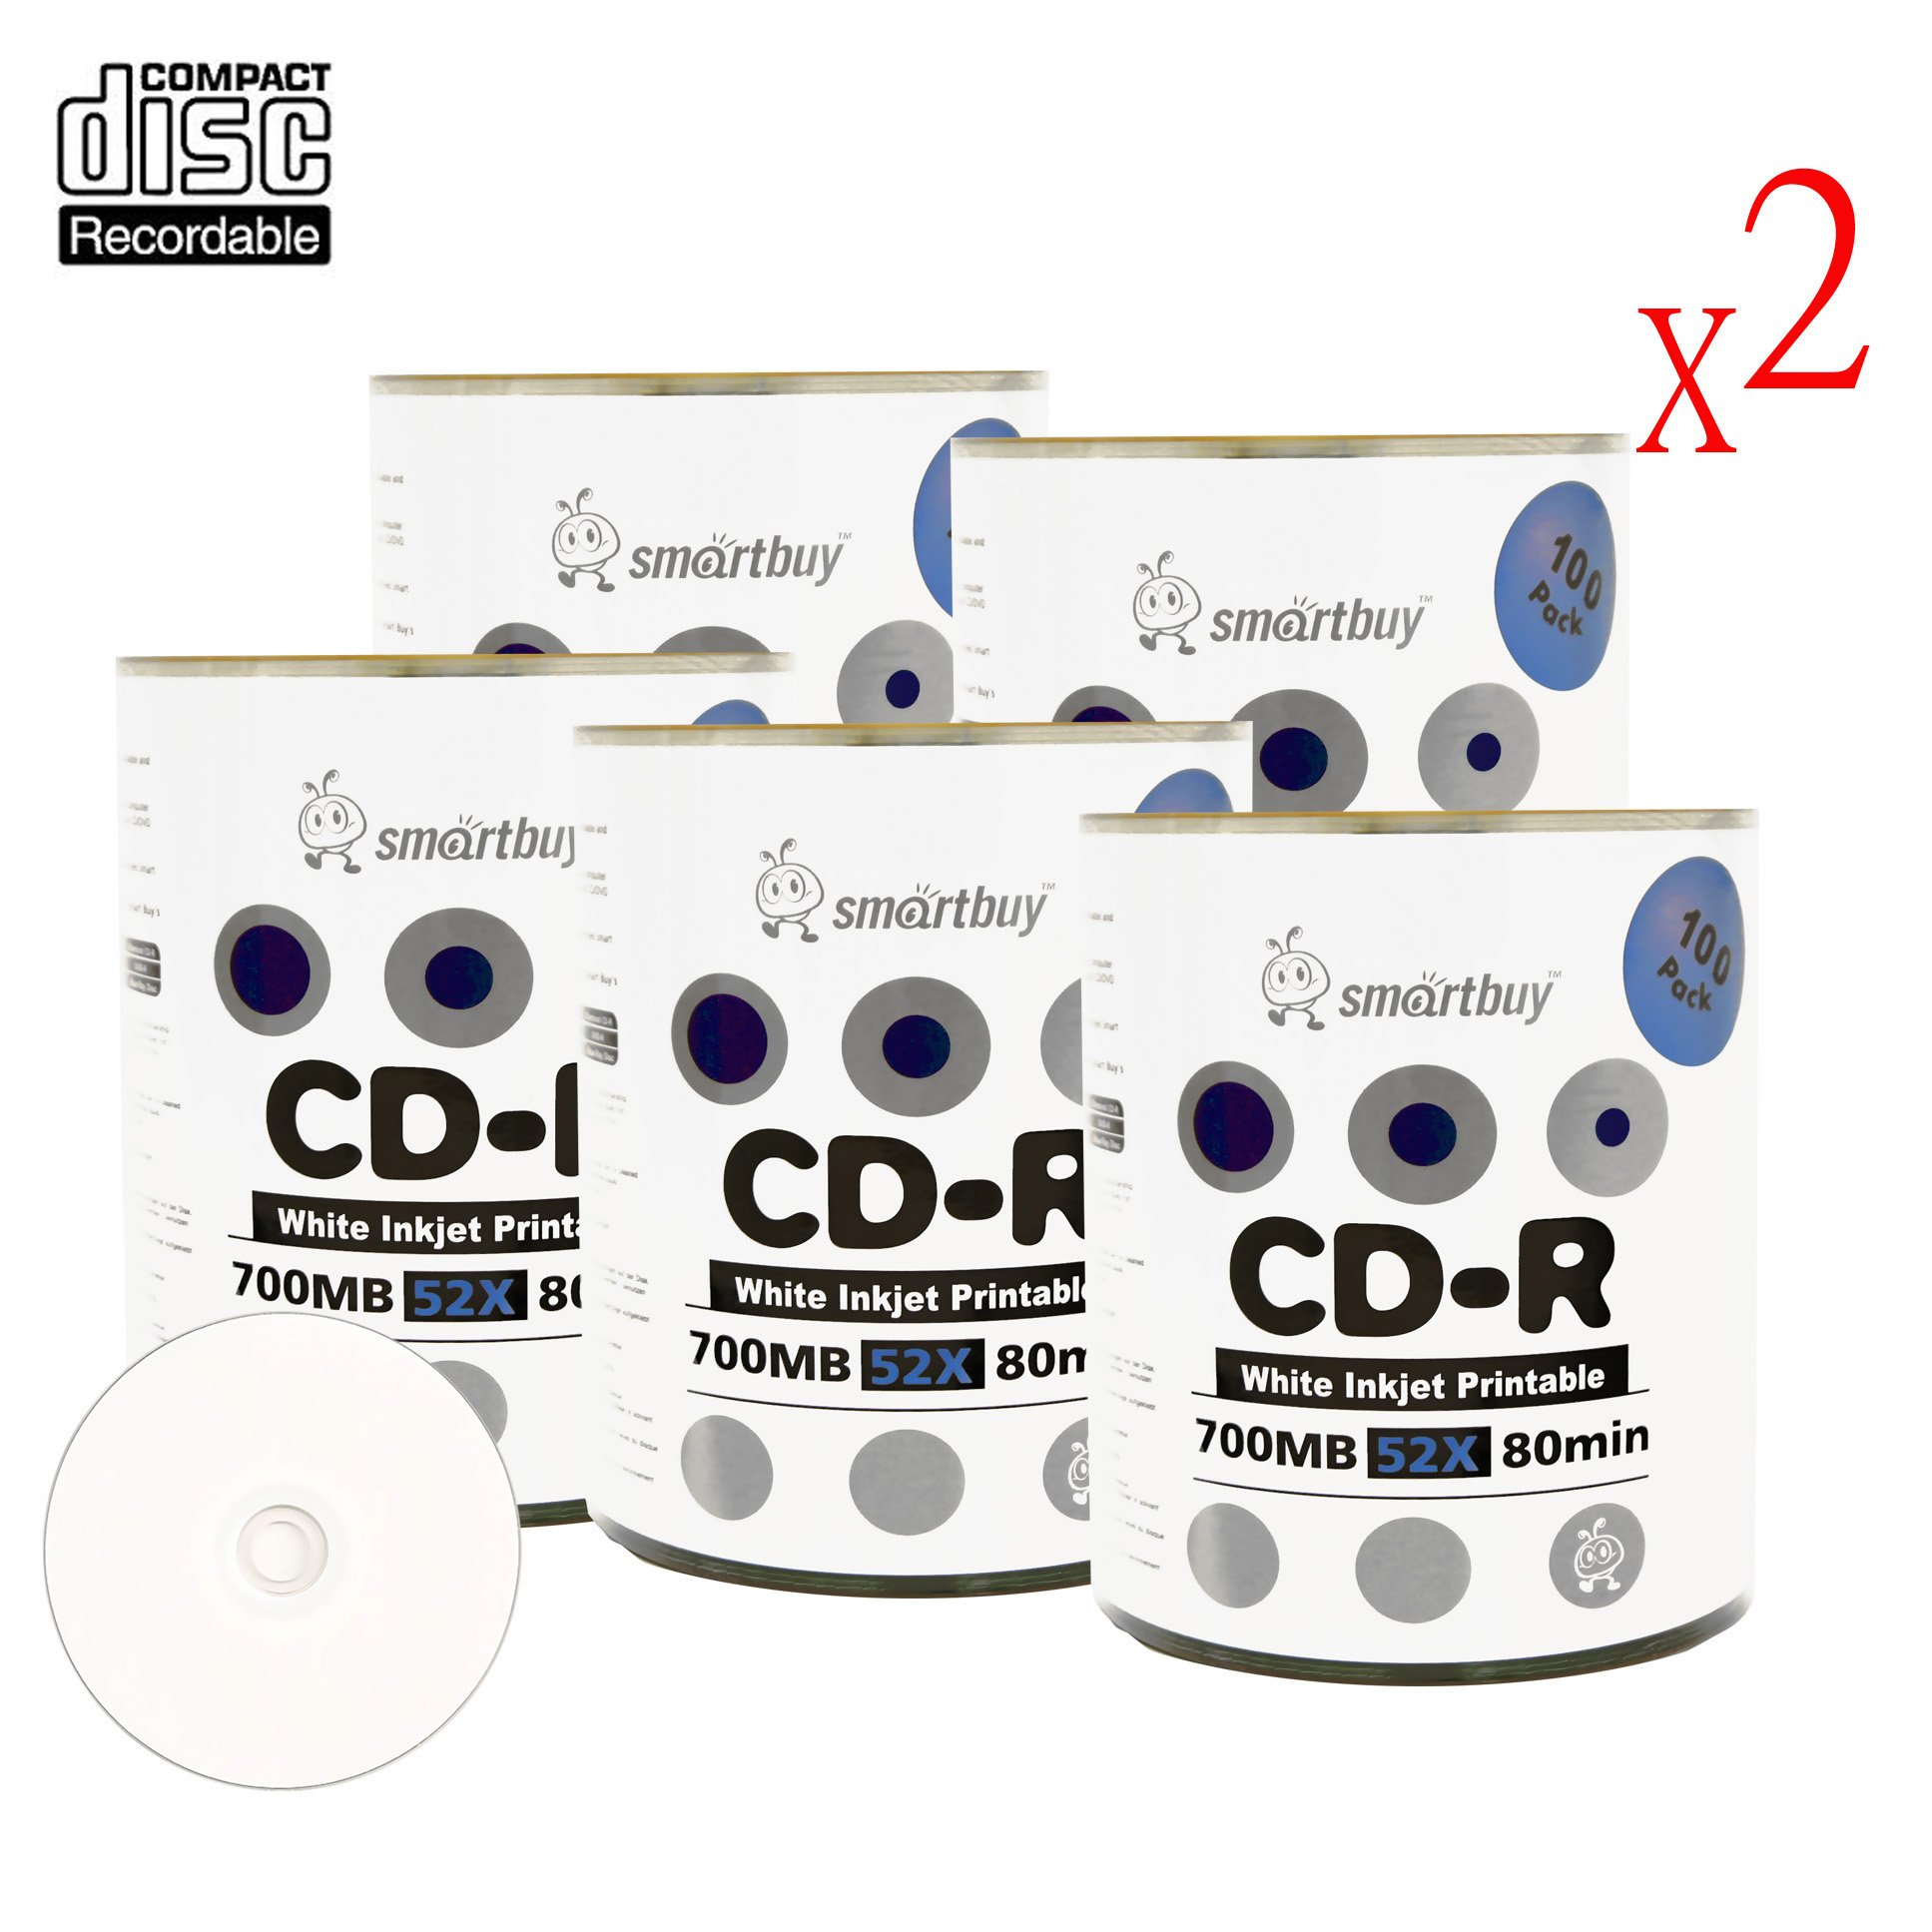 Smart Buy CD-R 1000 Pack 700mb 52x Printable White Inkjet Blank Recordable Discs, 1000 Disc, 1000pk by Smart Buy